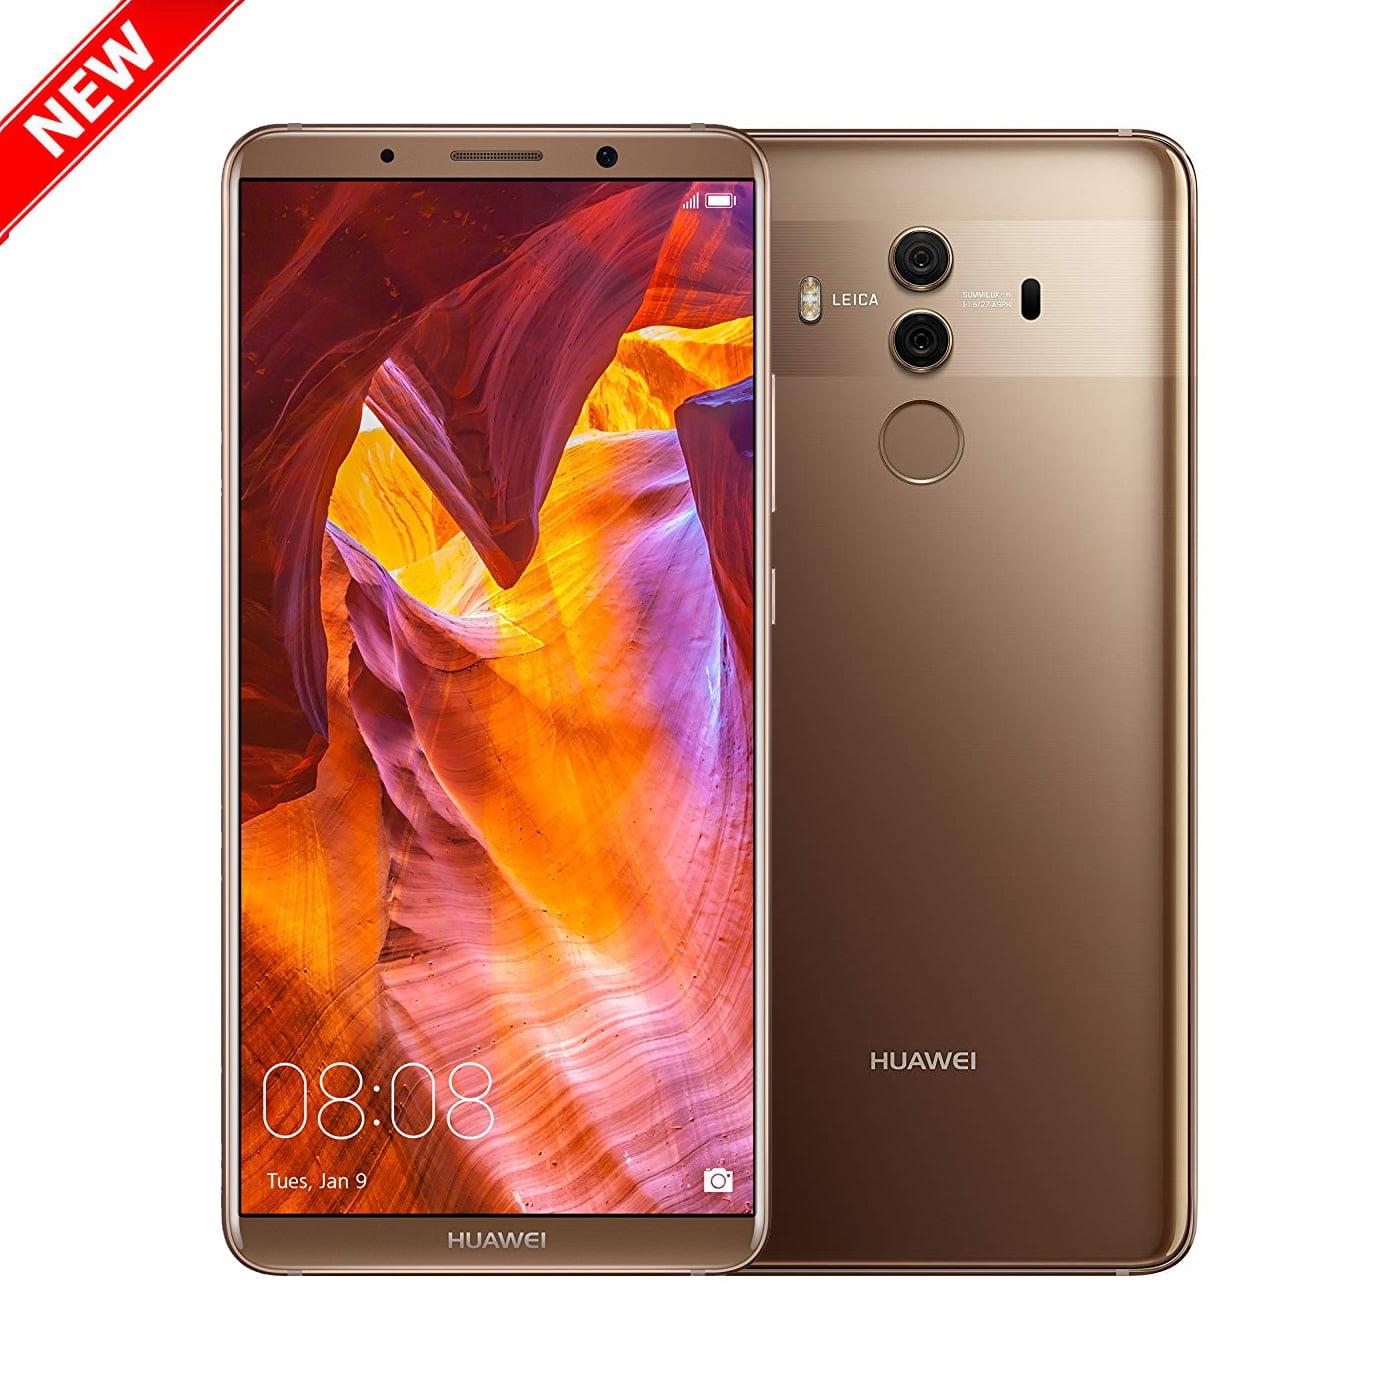 "New Mate 10 Pro 128GB BLA-A09 GSM Unlocked 4G LTE 6"" AMOLED Display 6GB RAM Dual 12MP + 20MP Camera Smartphone by Huawei - Mocha Brown - USA WARRANTY"